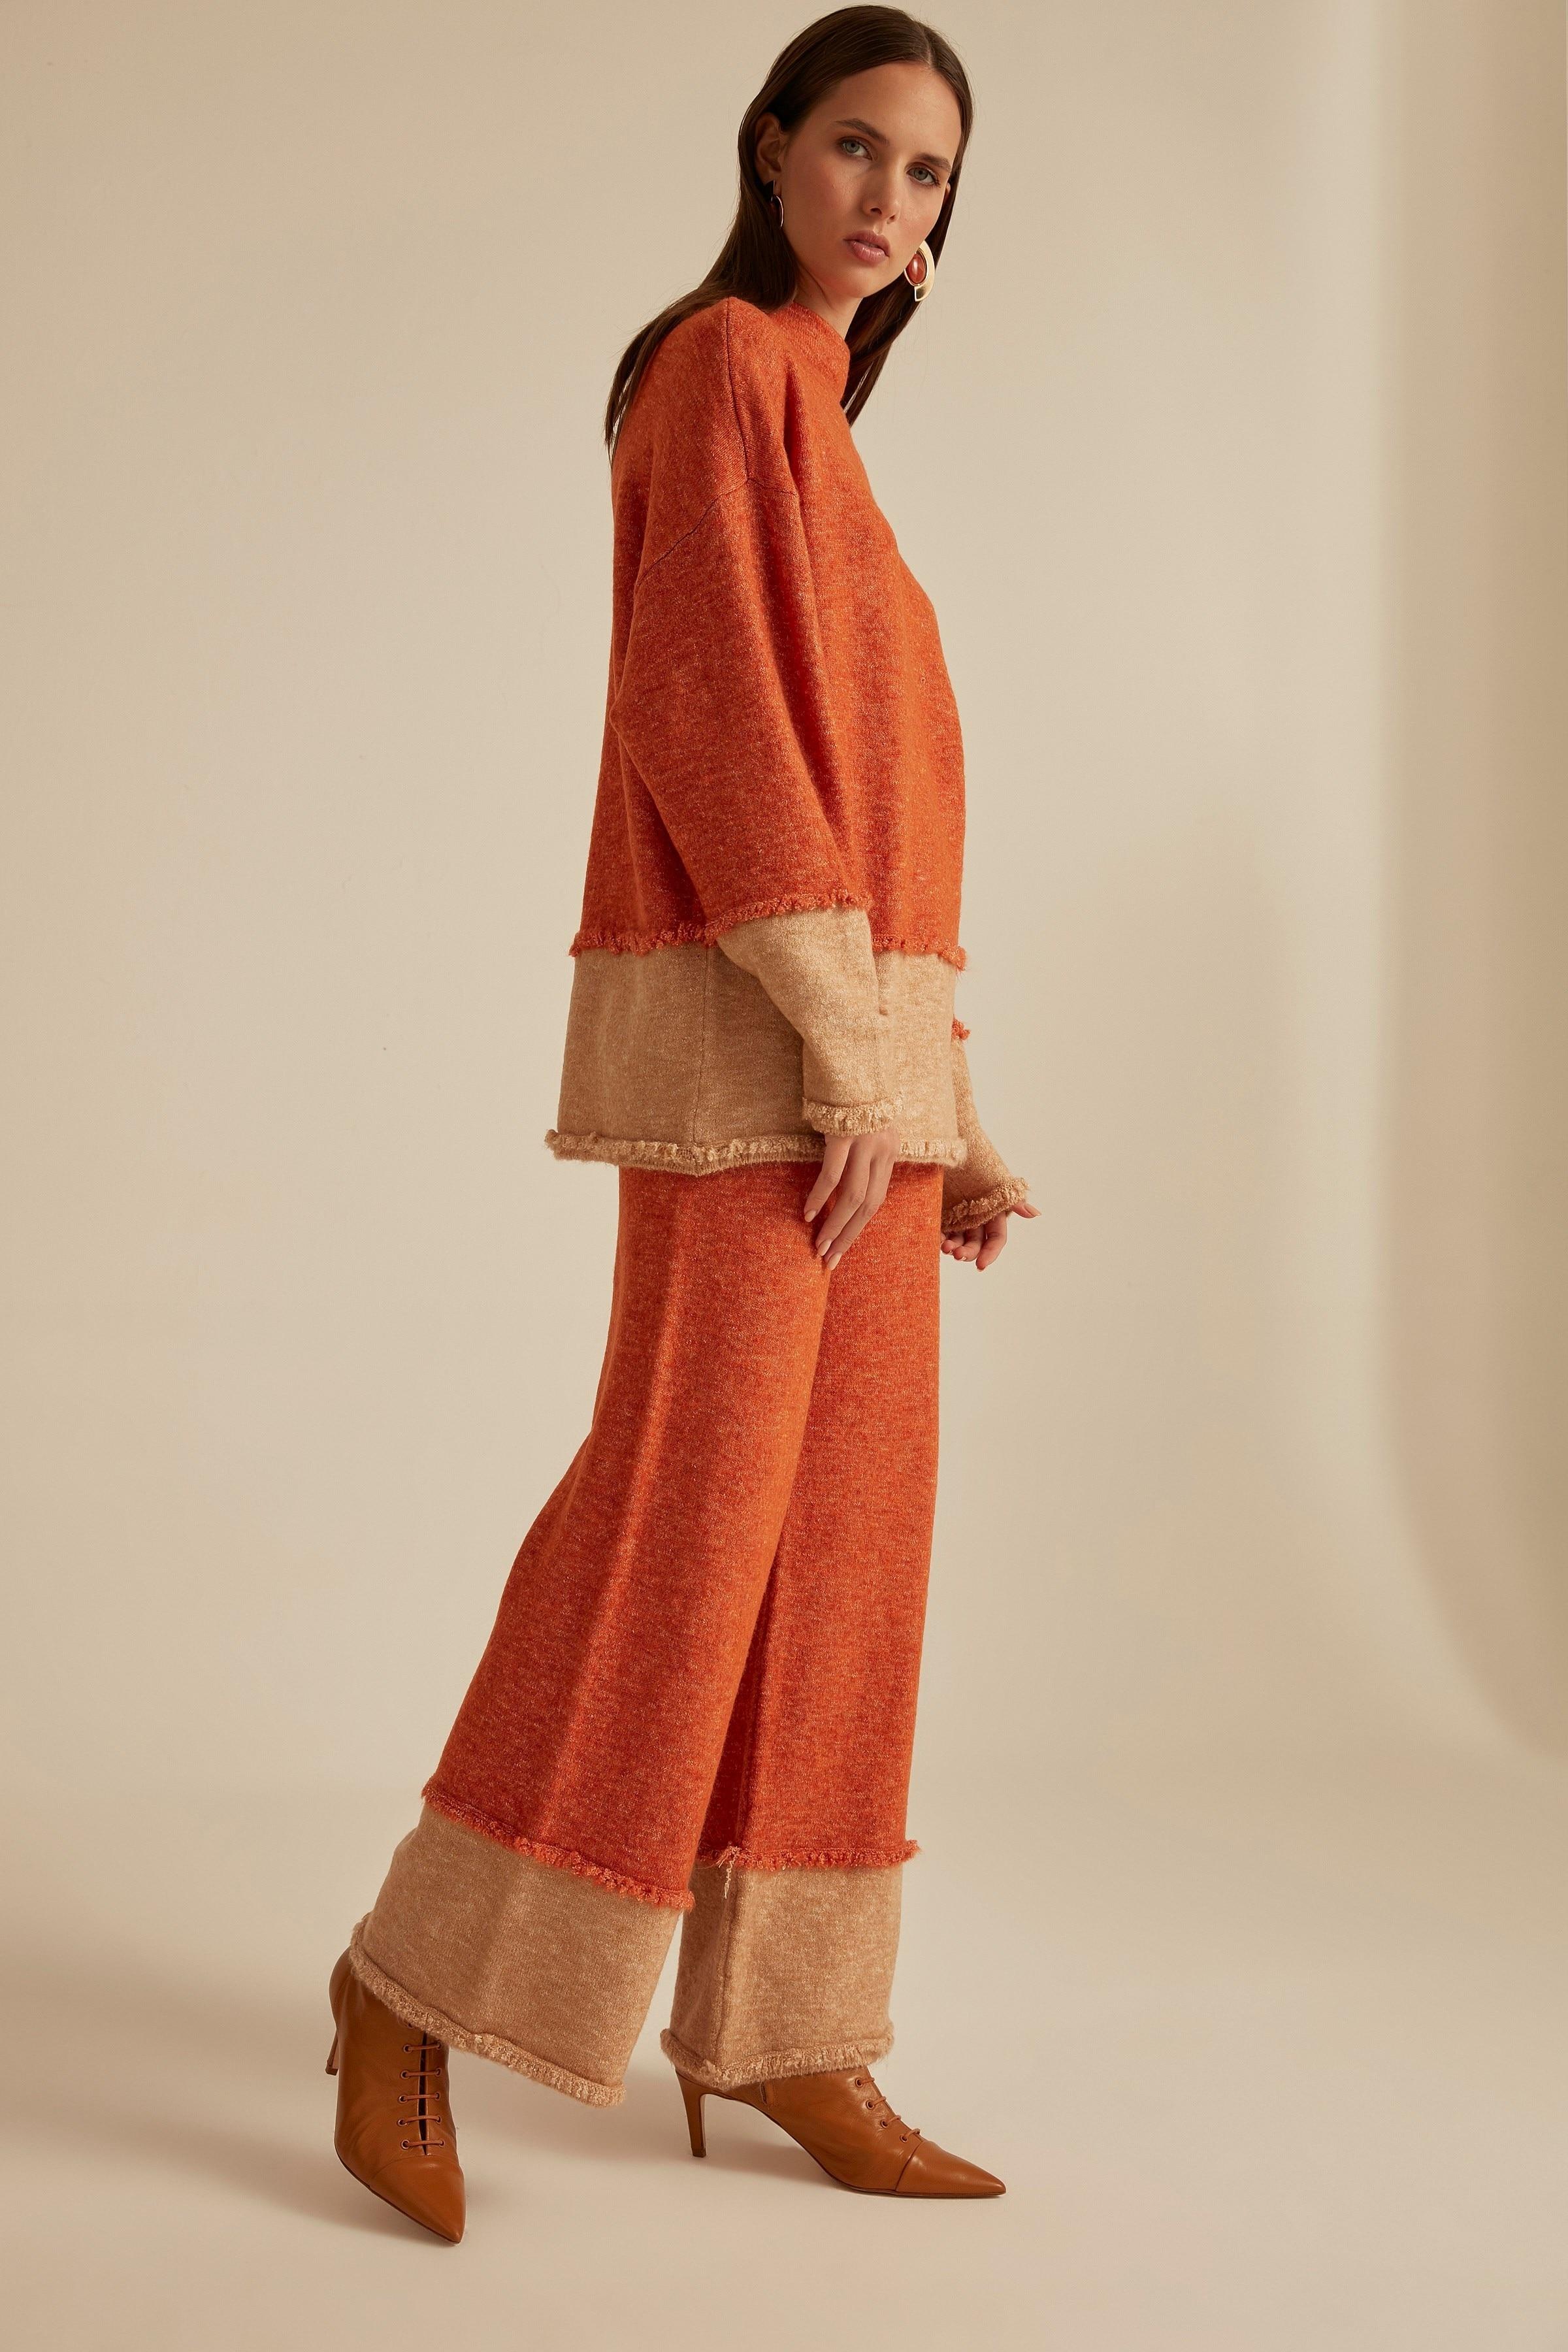 Pantalones de Jersey entallado con detalle de borlas